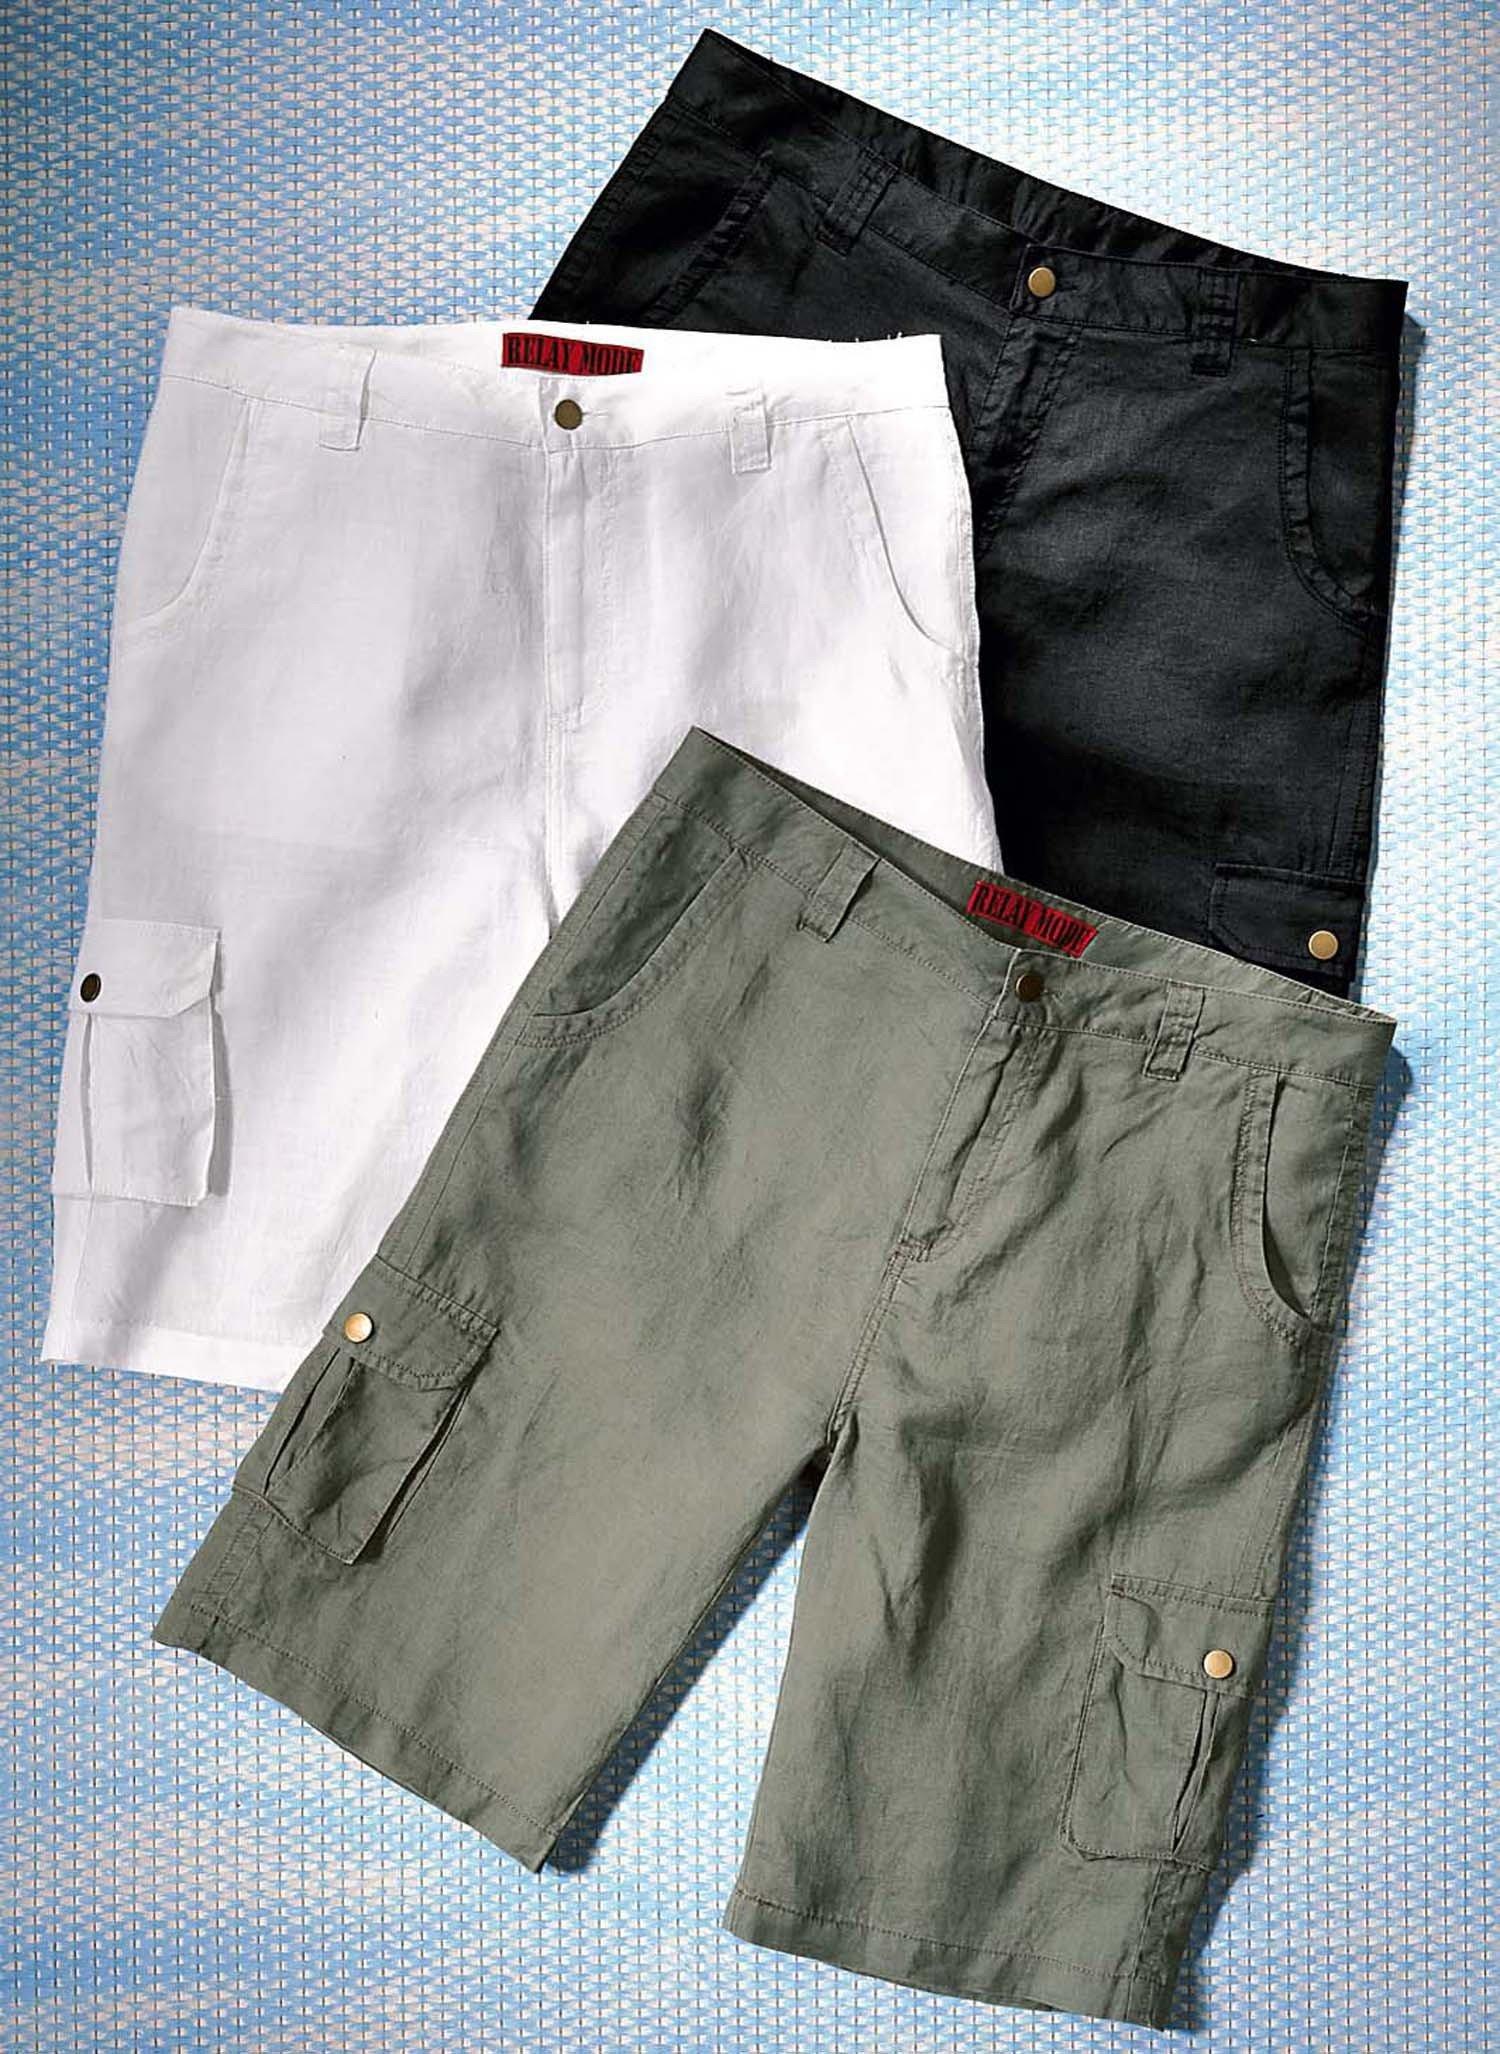 H-Leinen-Shorts olive L 086 - 1 - Ronja.ch